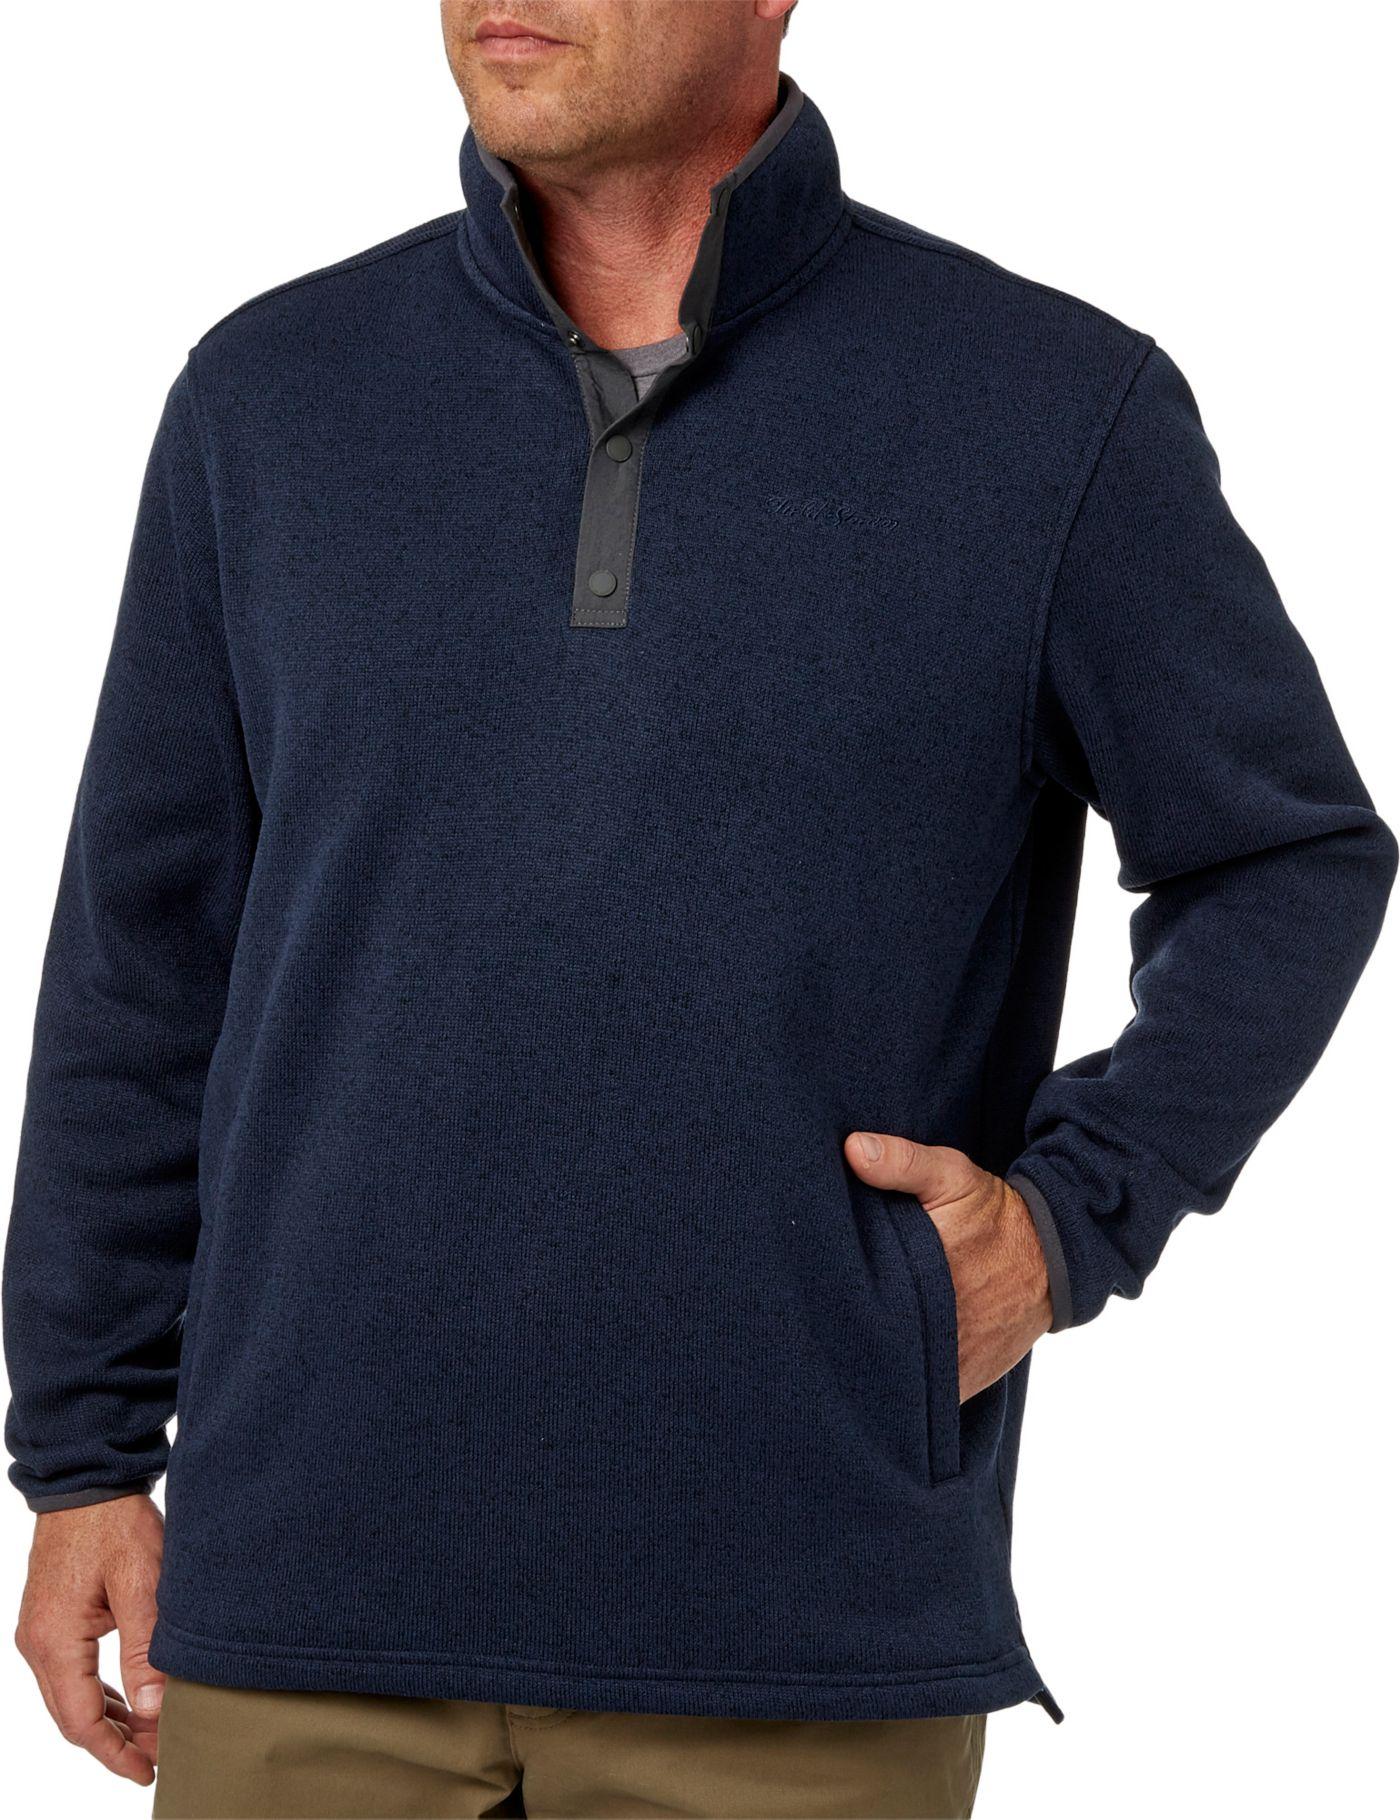 Field & Stream Men's Snap Sweater Fleece Pullover